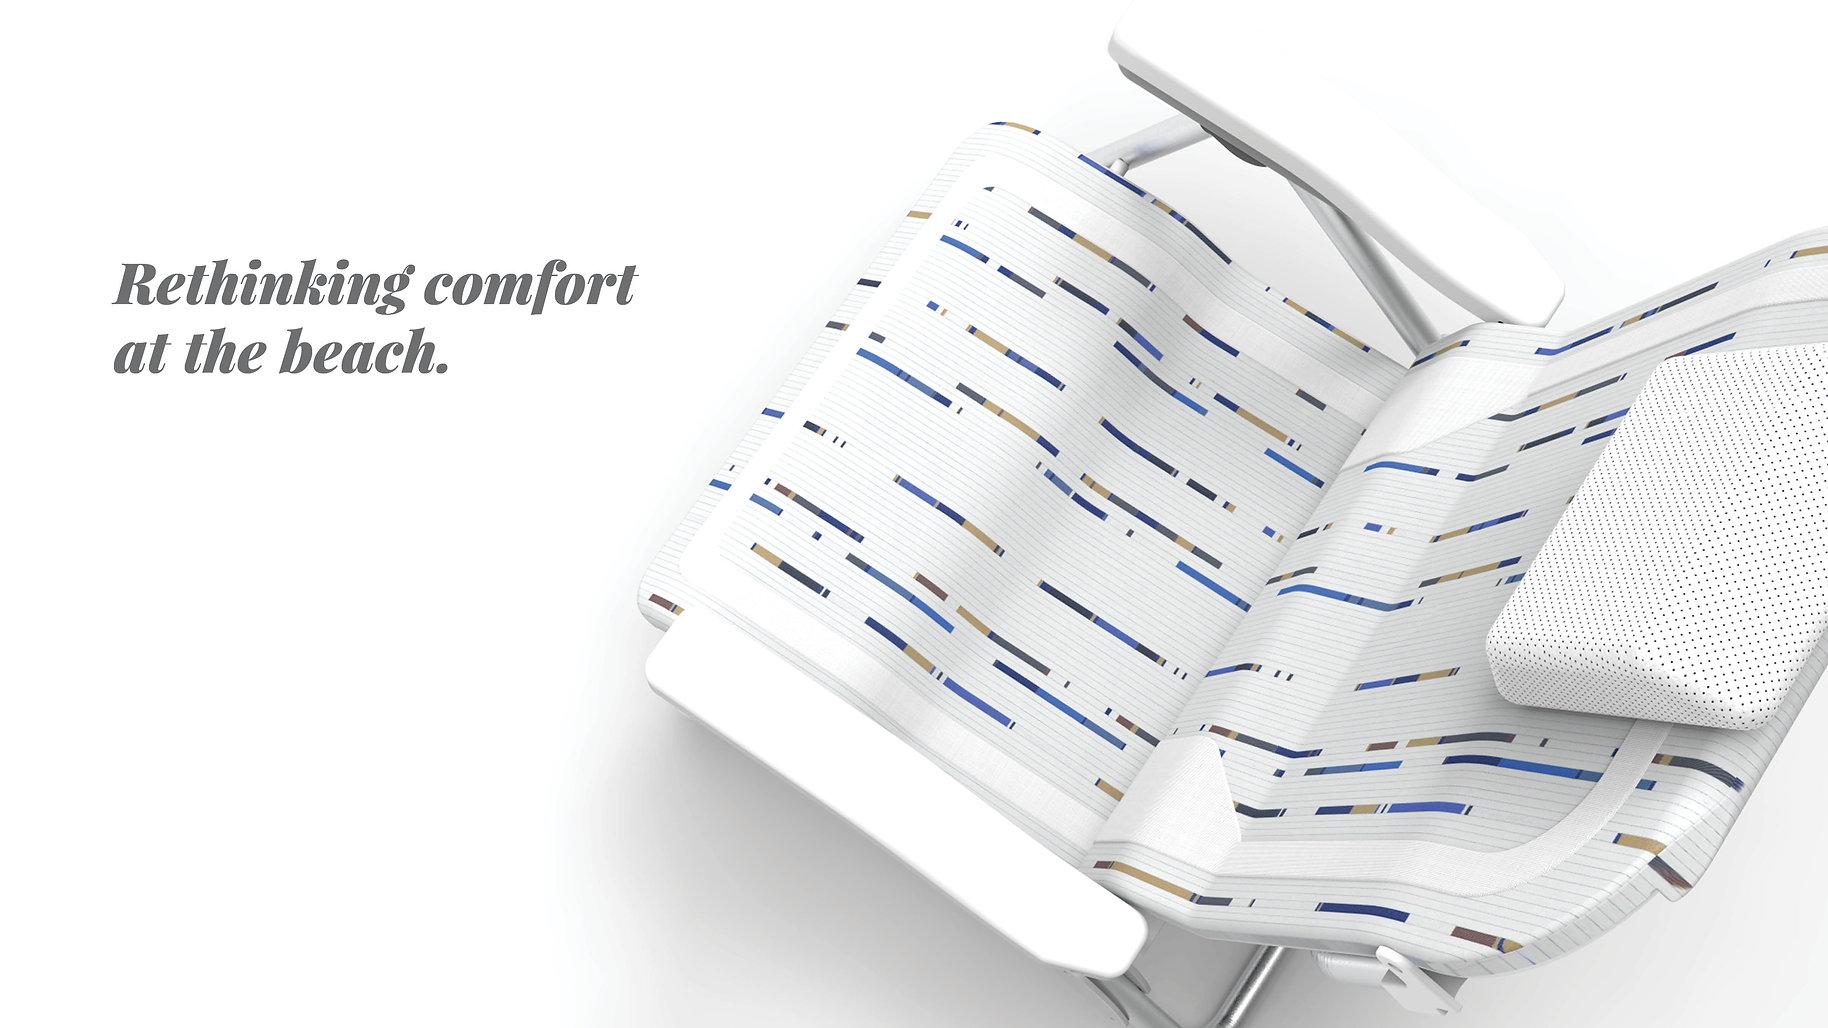 Rethinking comfort5.jpg